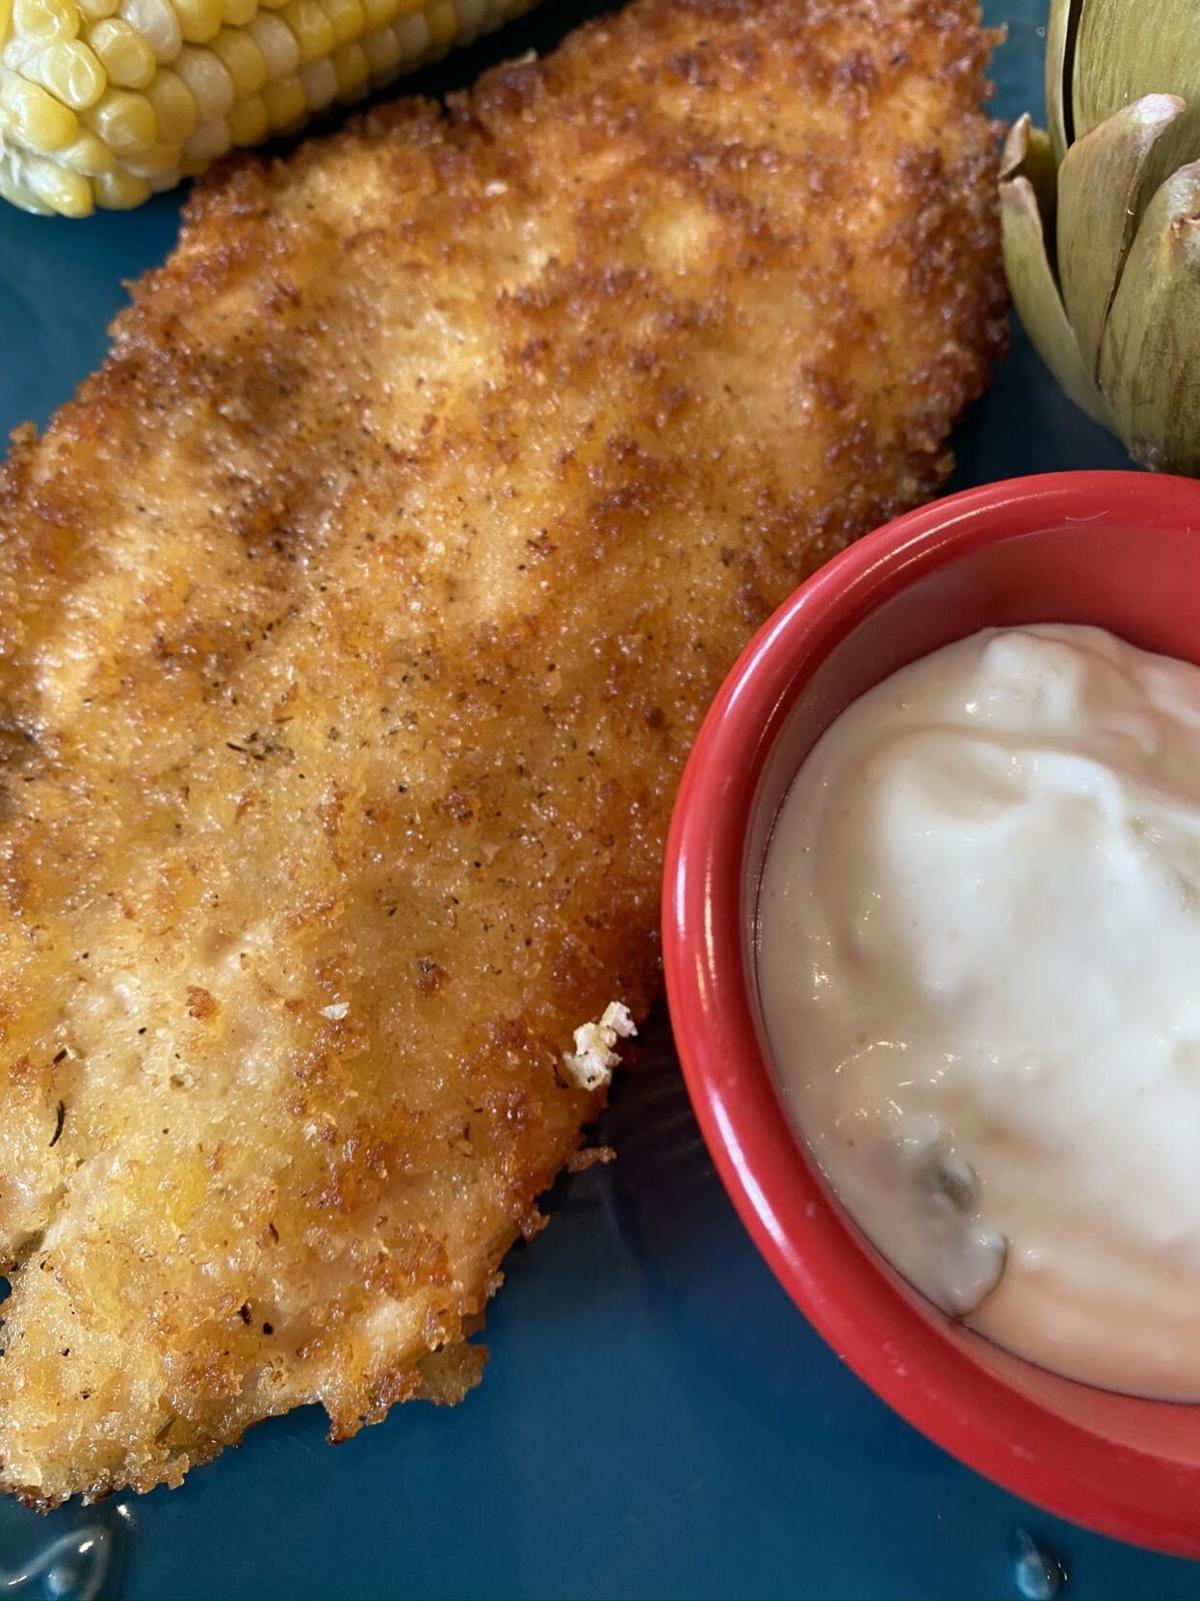 Belle's Pan-fried Trout